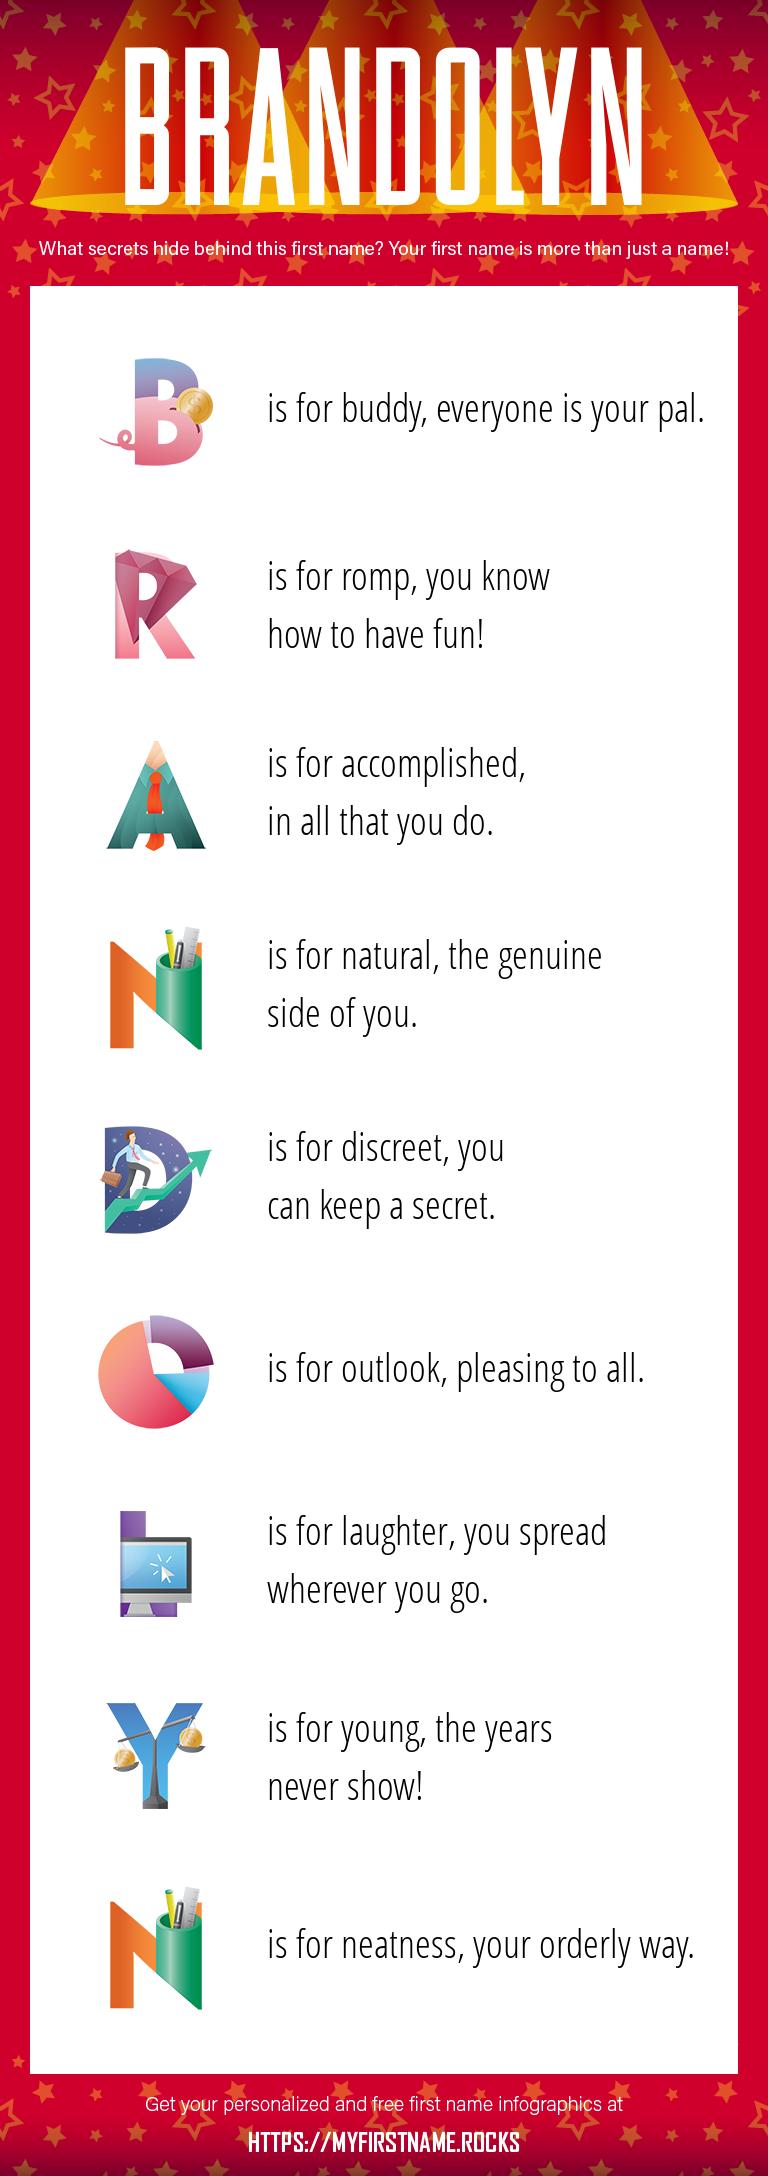 Brandolyn Infographics